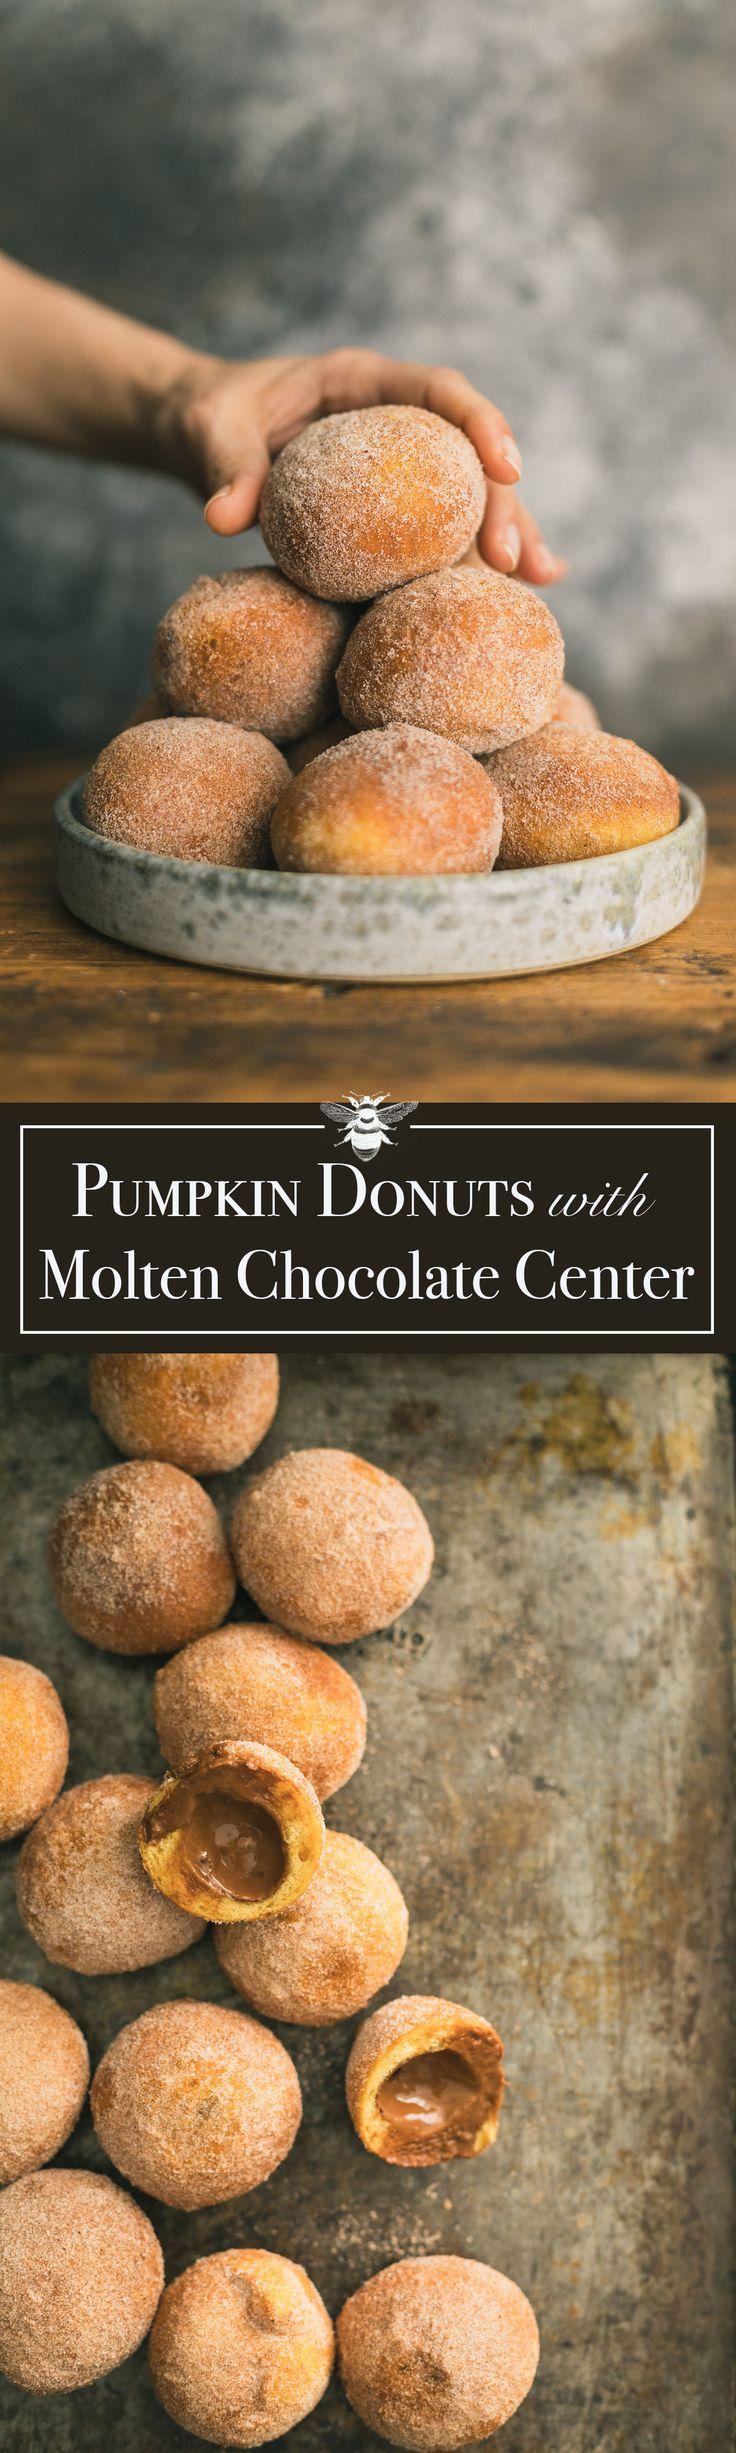 Pumpkin Brioche Donuts with Molten Chocolate Truffle Center